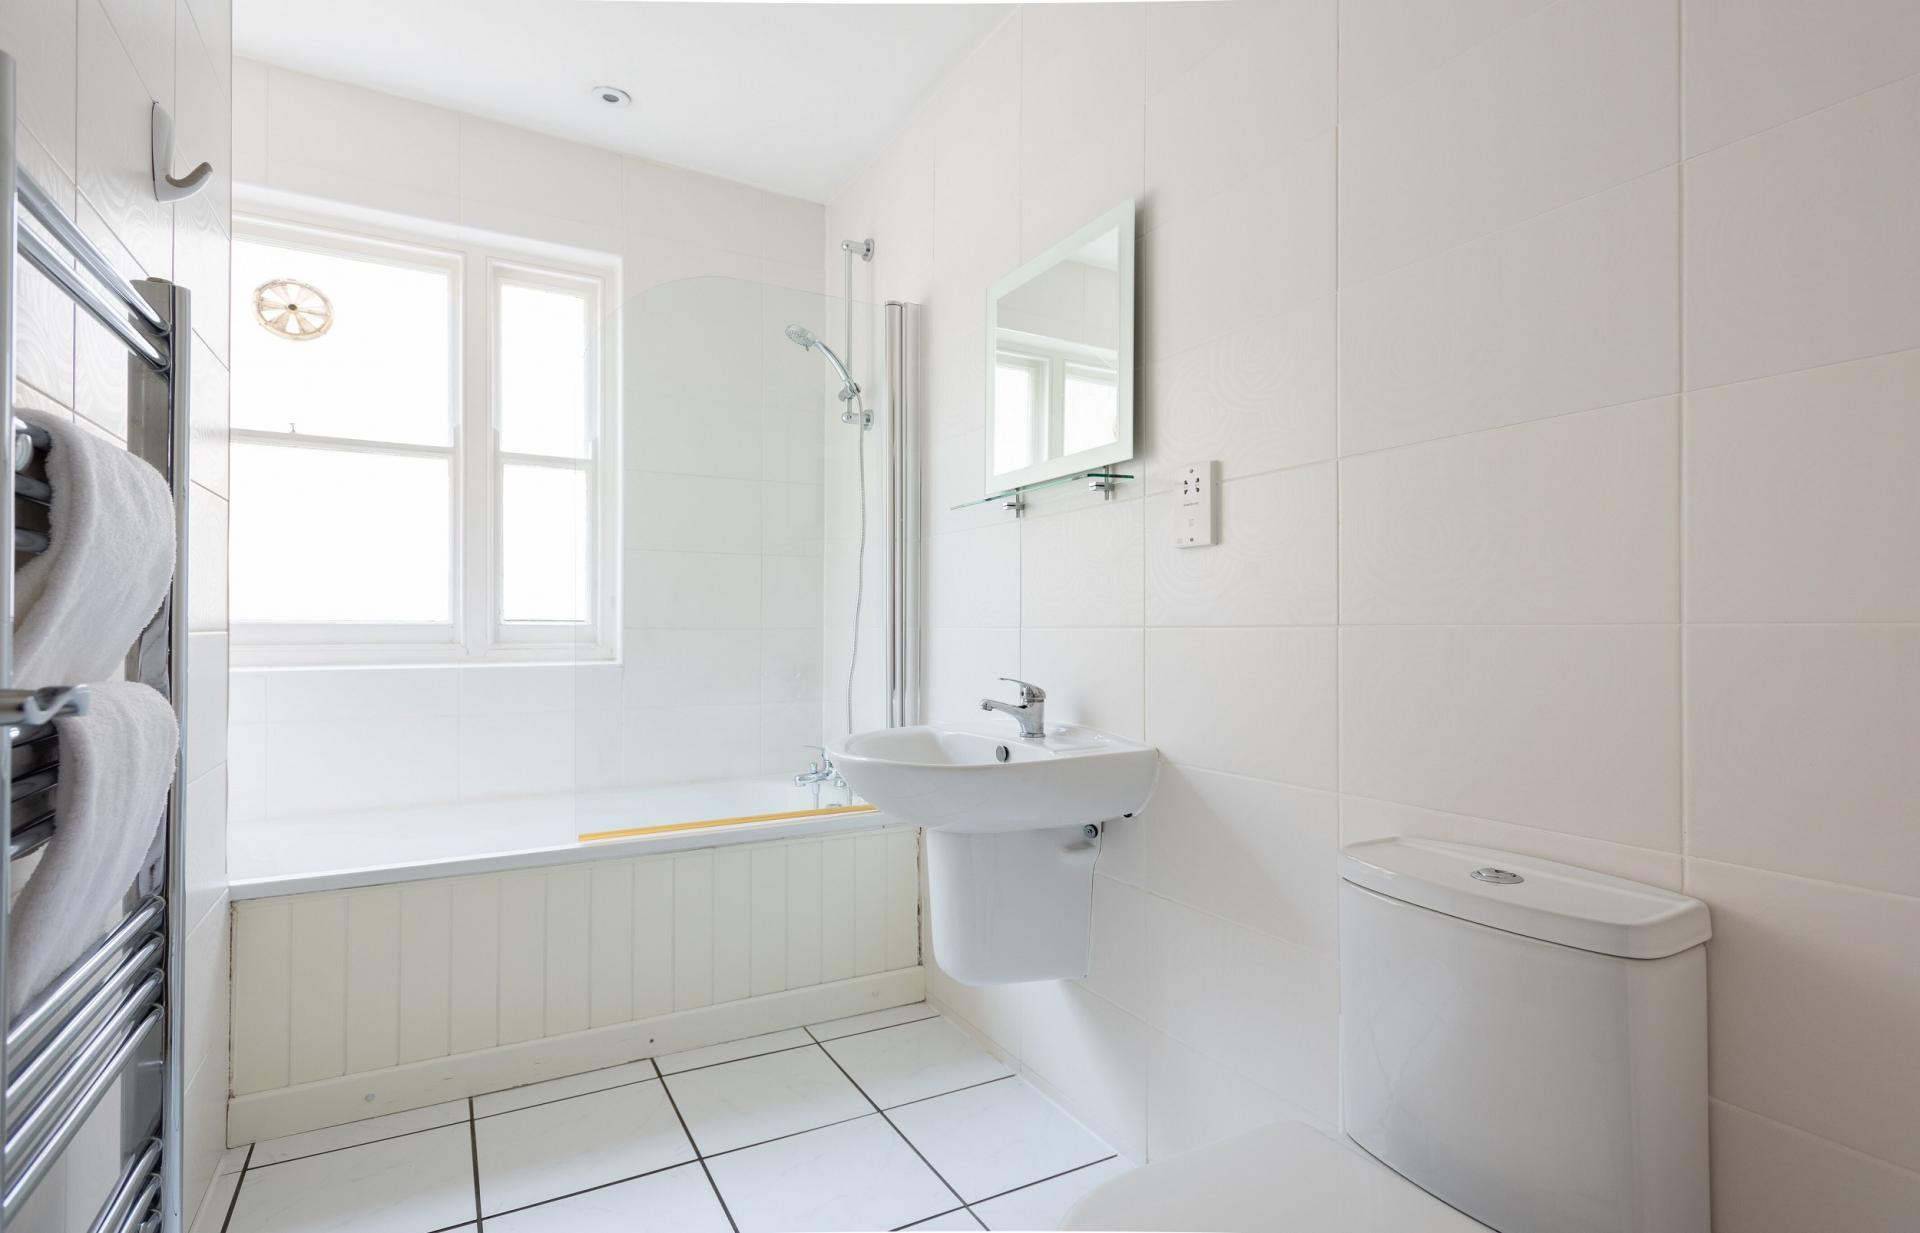 Bathroom at The Kensington Palace Mews, Kensington, London - Citybase Apartments